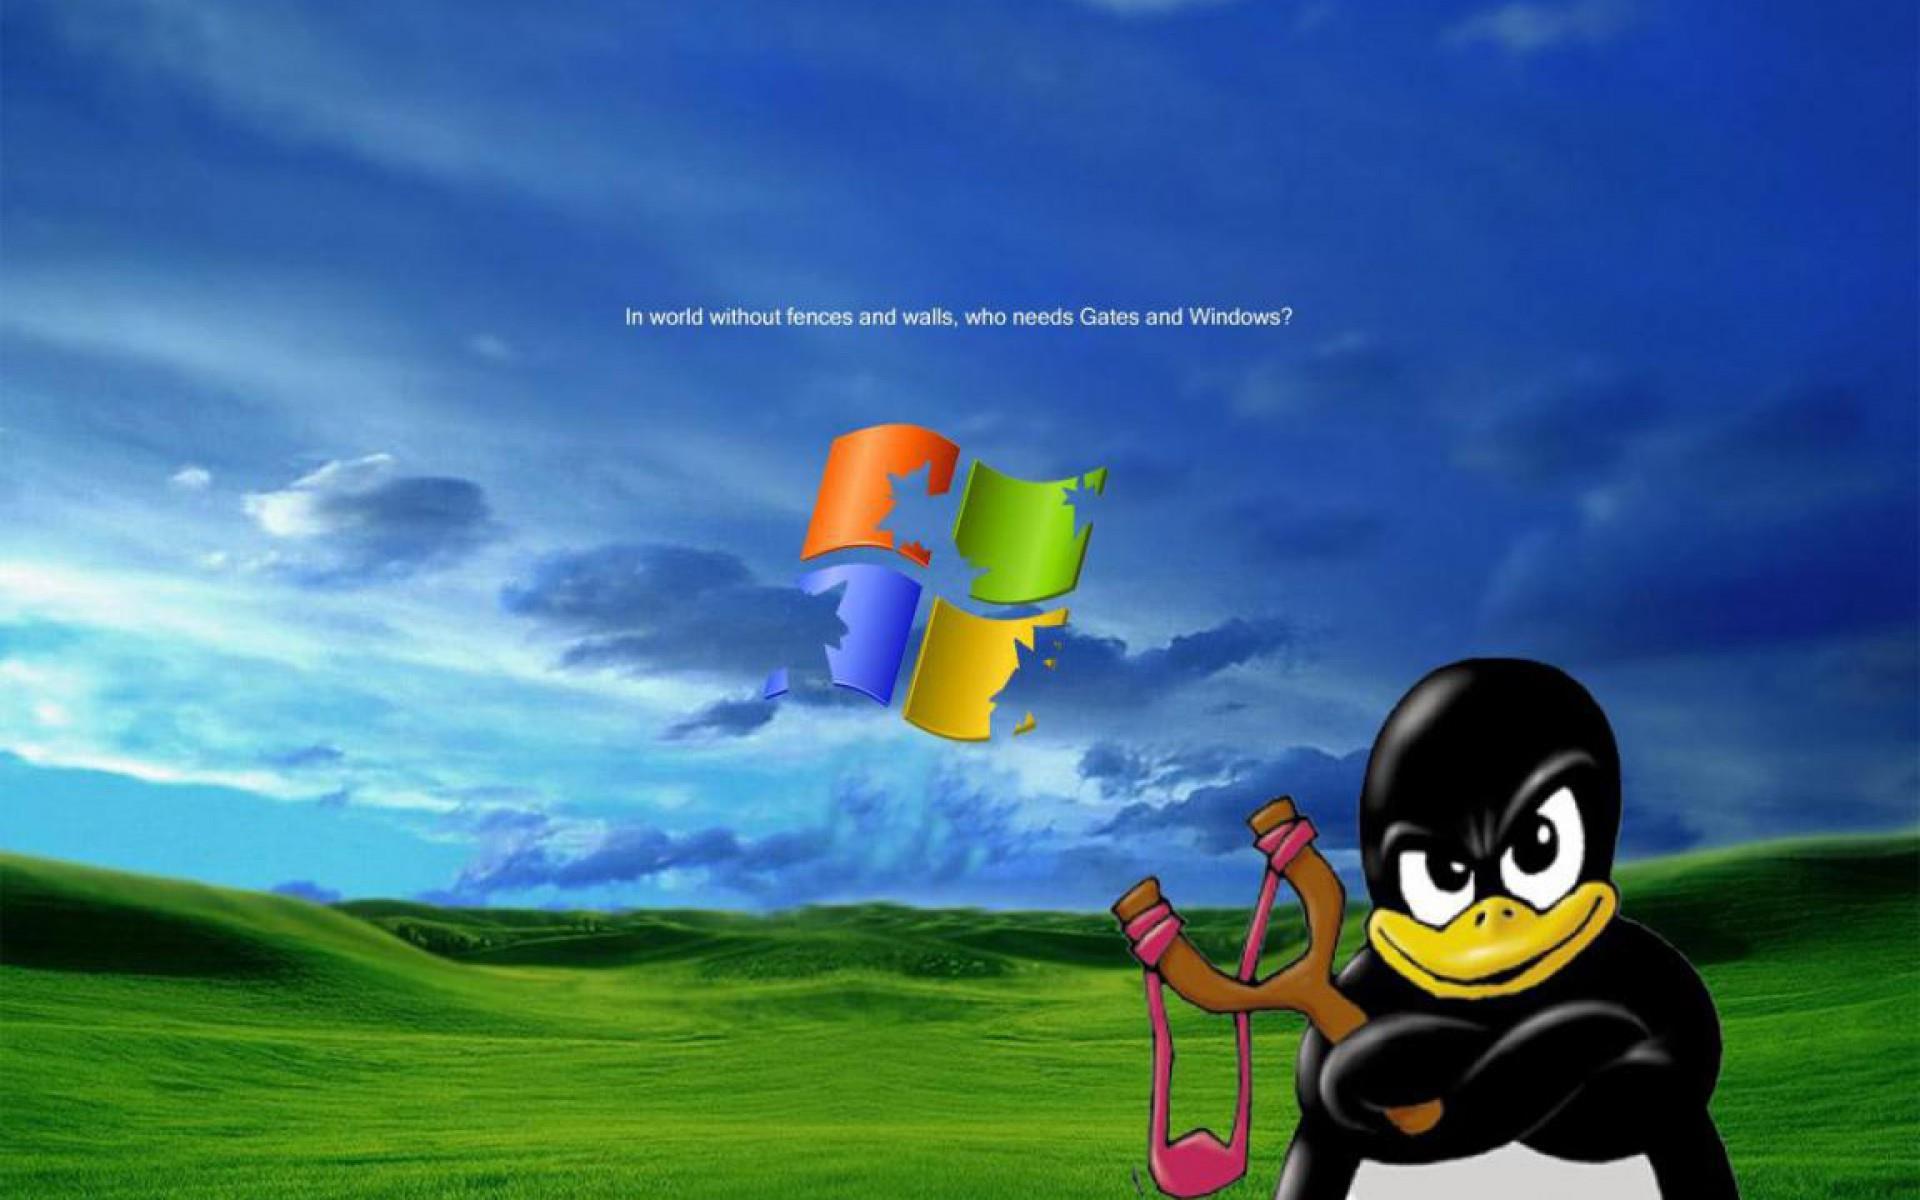 linux-ubuntu-wallpaper-OS-free-tux-le-manchot_3